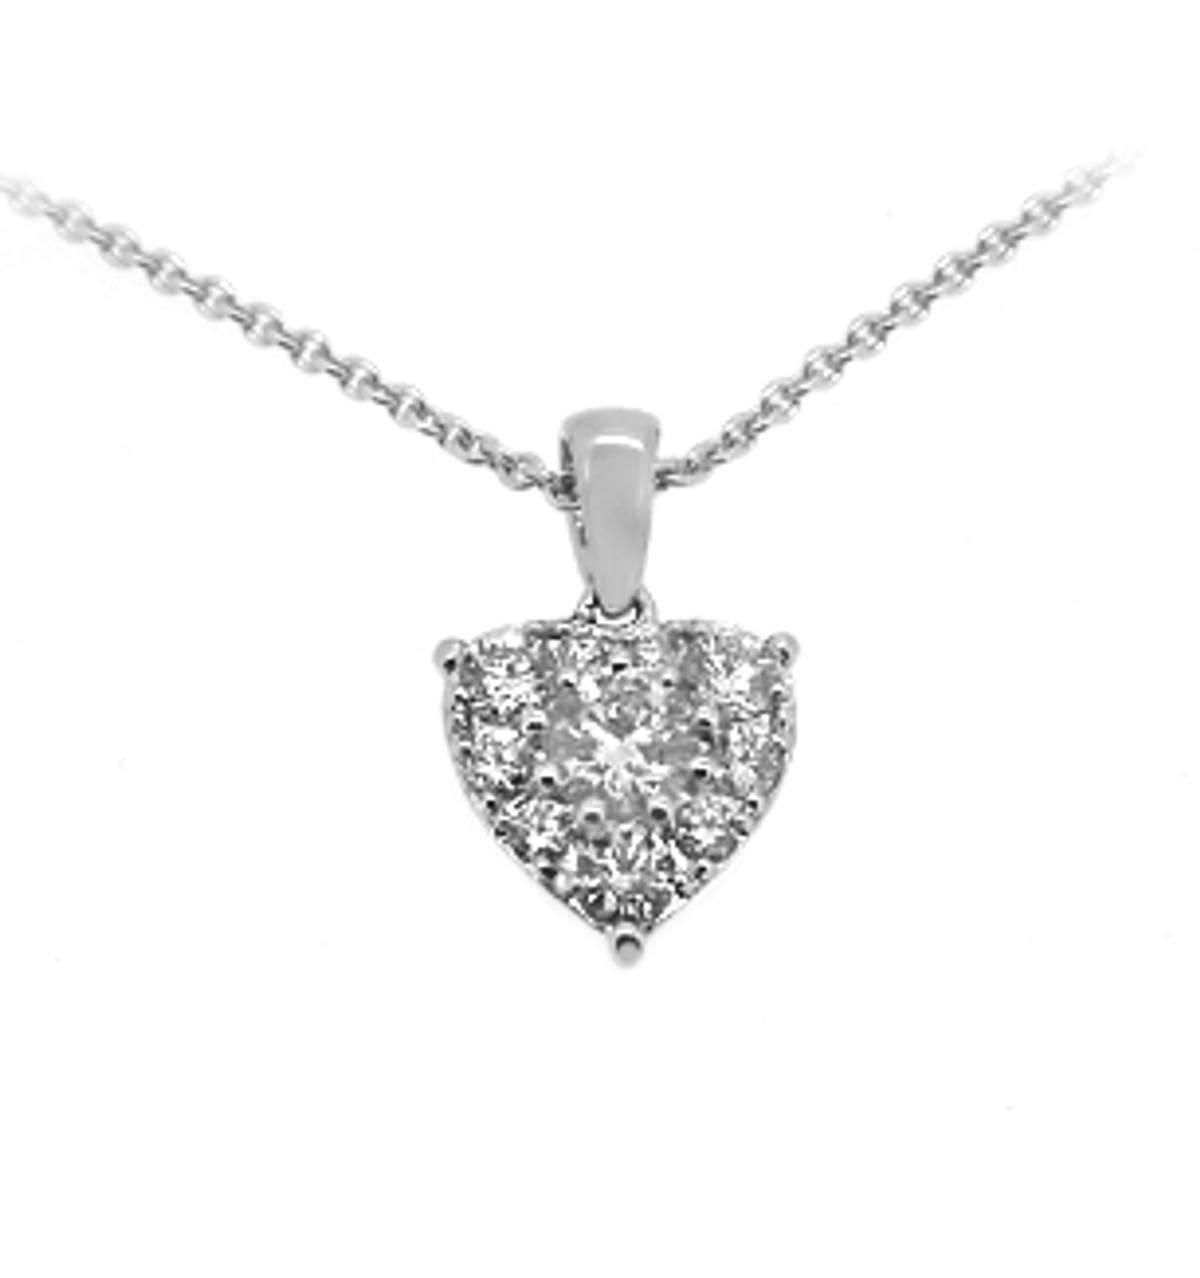 "18k White Gold Brilliant Cut Diamond Heart Shape Cluster Pendant On 18k White Gold 18""  Total diamond weight 0.43cts Pendant length 1.4cmPendant width 0.9cm"